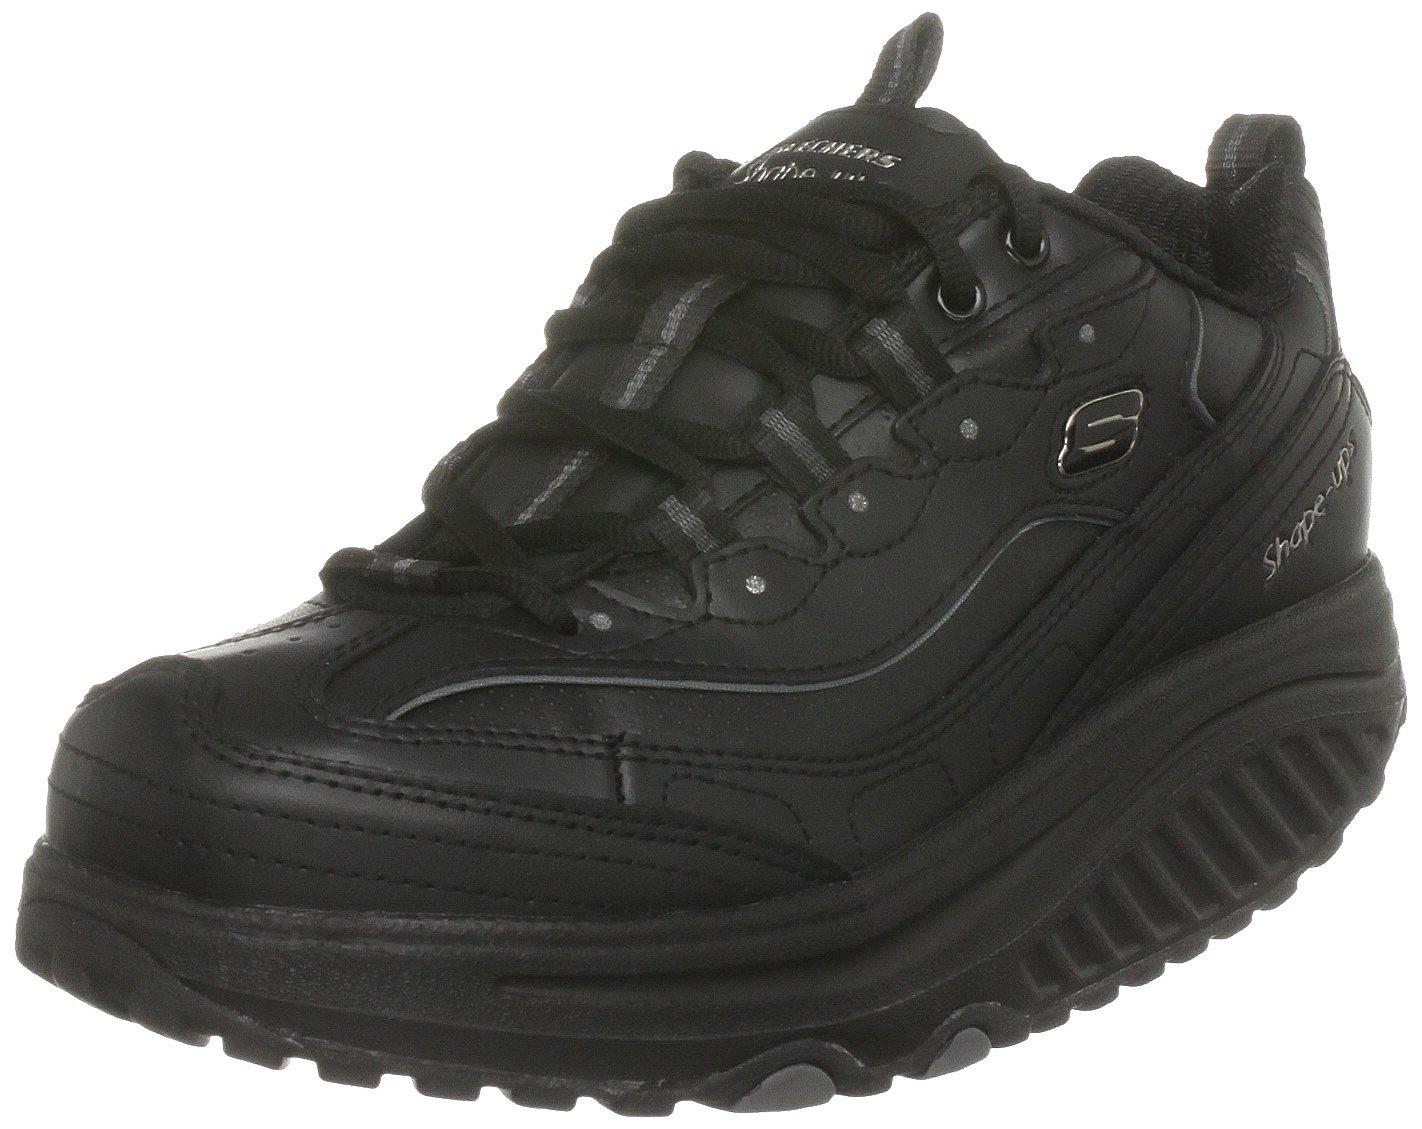 Skechers Women's Shape Ups Metabolize Fitness Work Out Sneaker,Black,8 M US